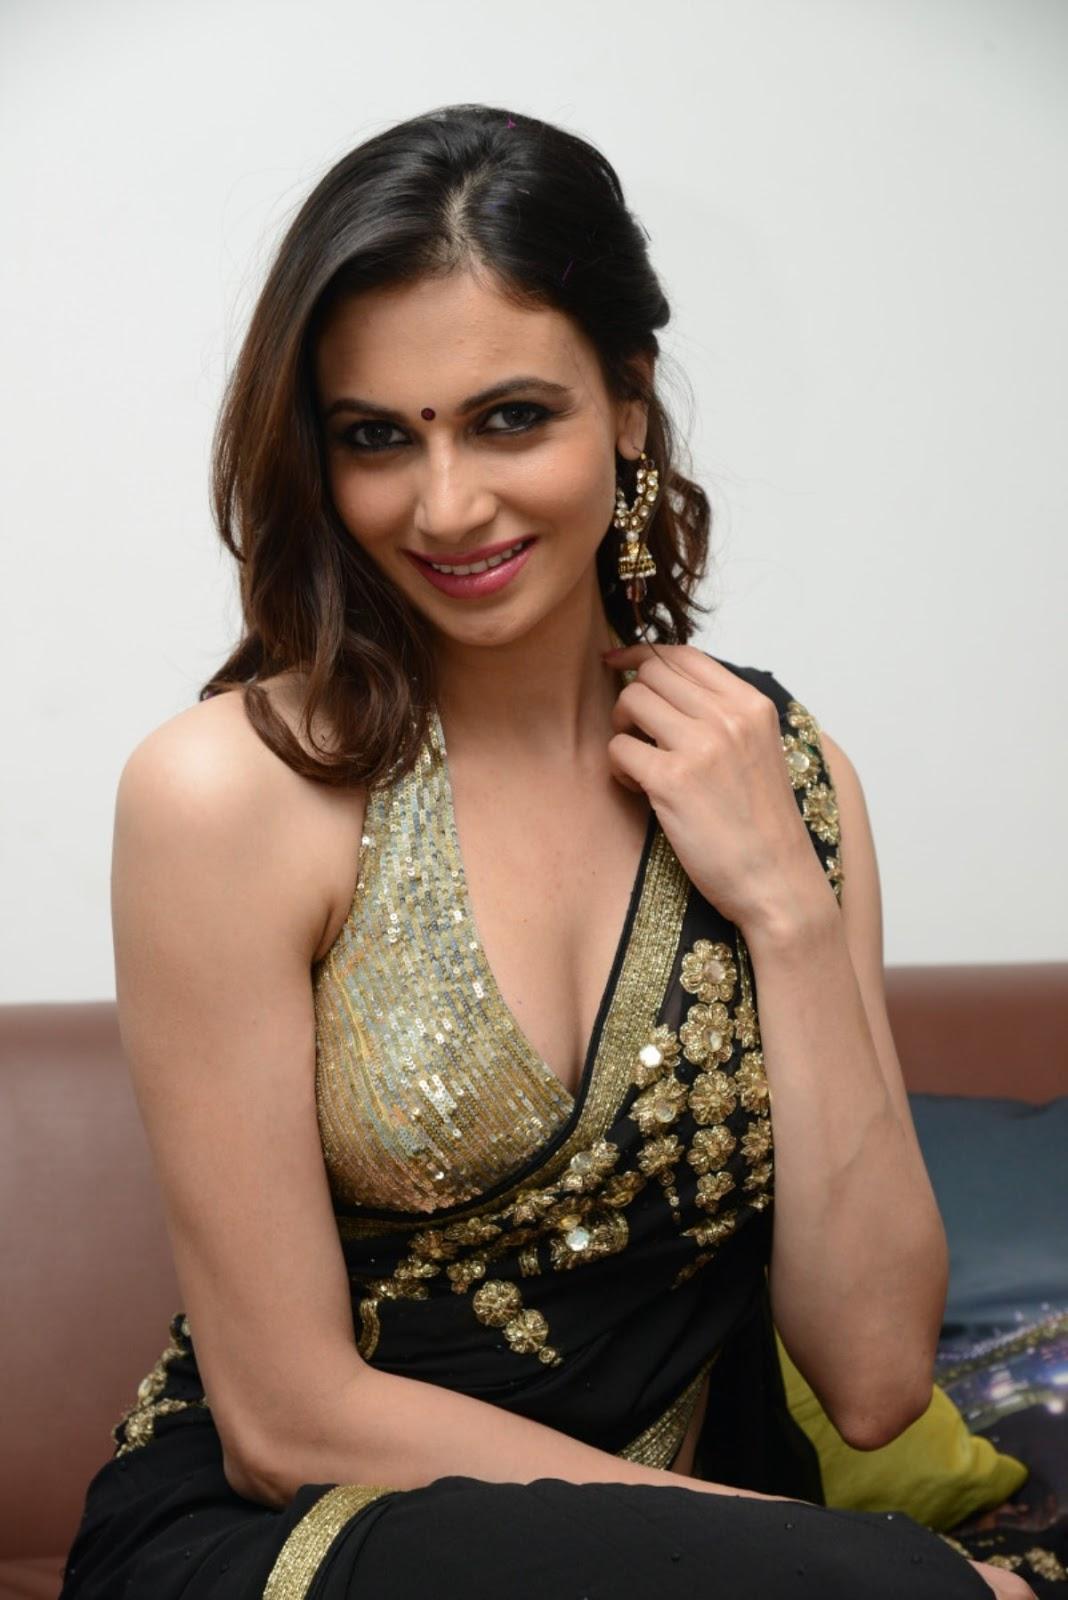 Simran Kaur Hot Cleavage Show Photos In Saree - Hot Blog -1602